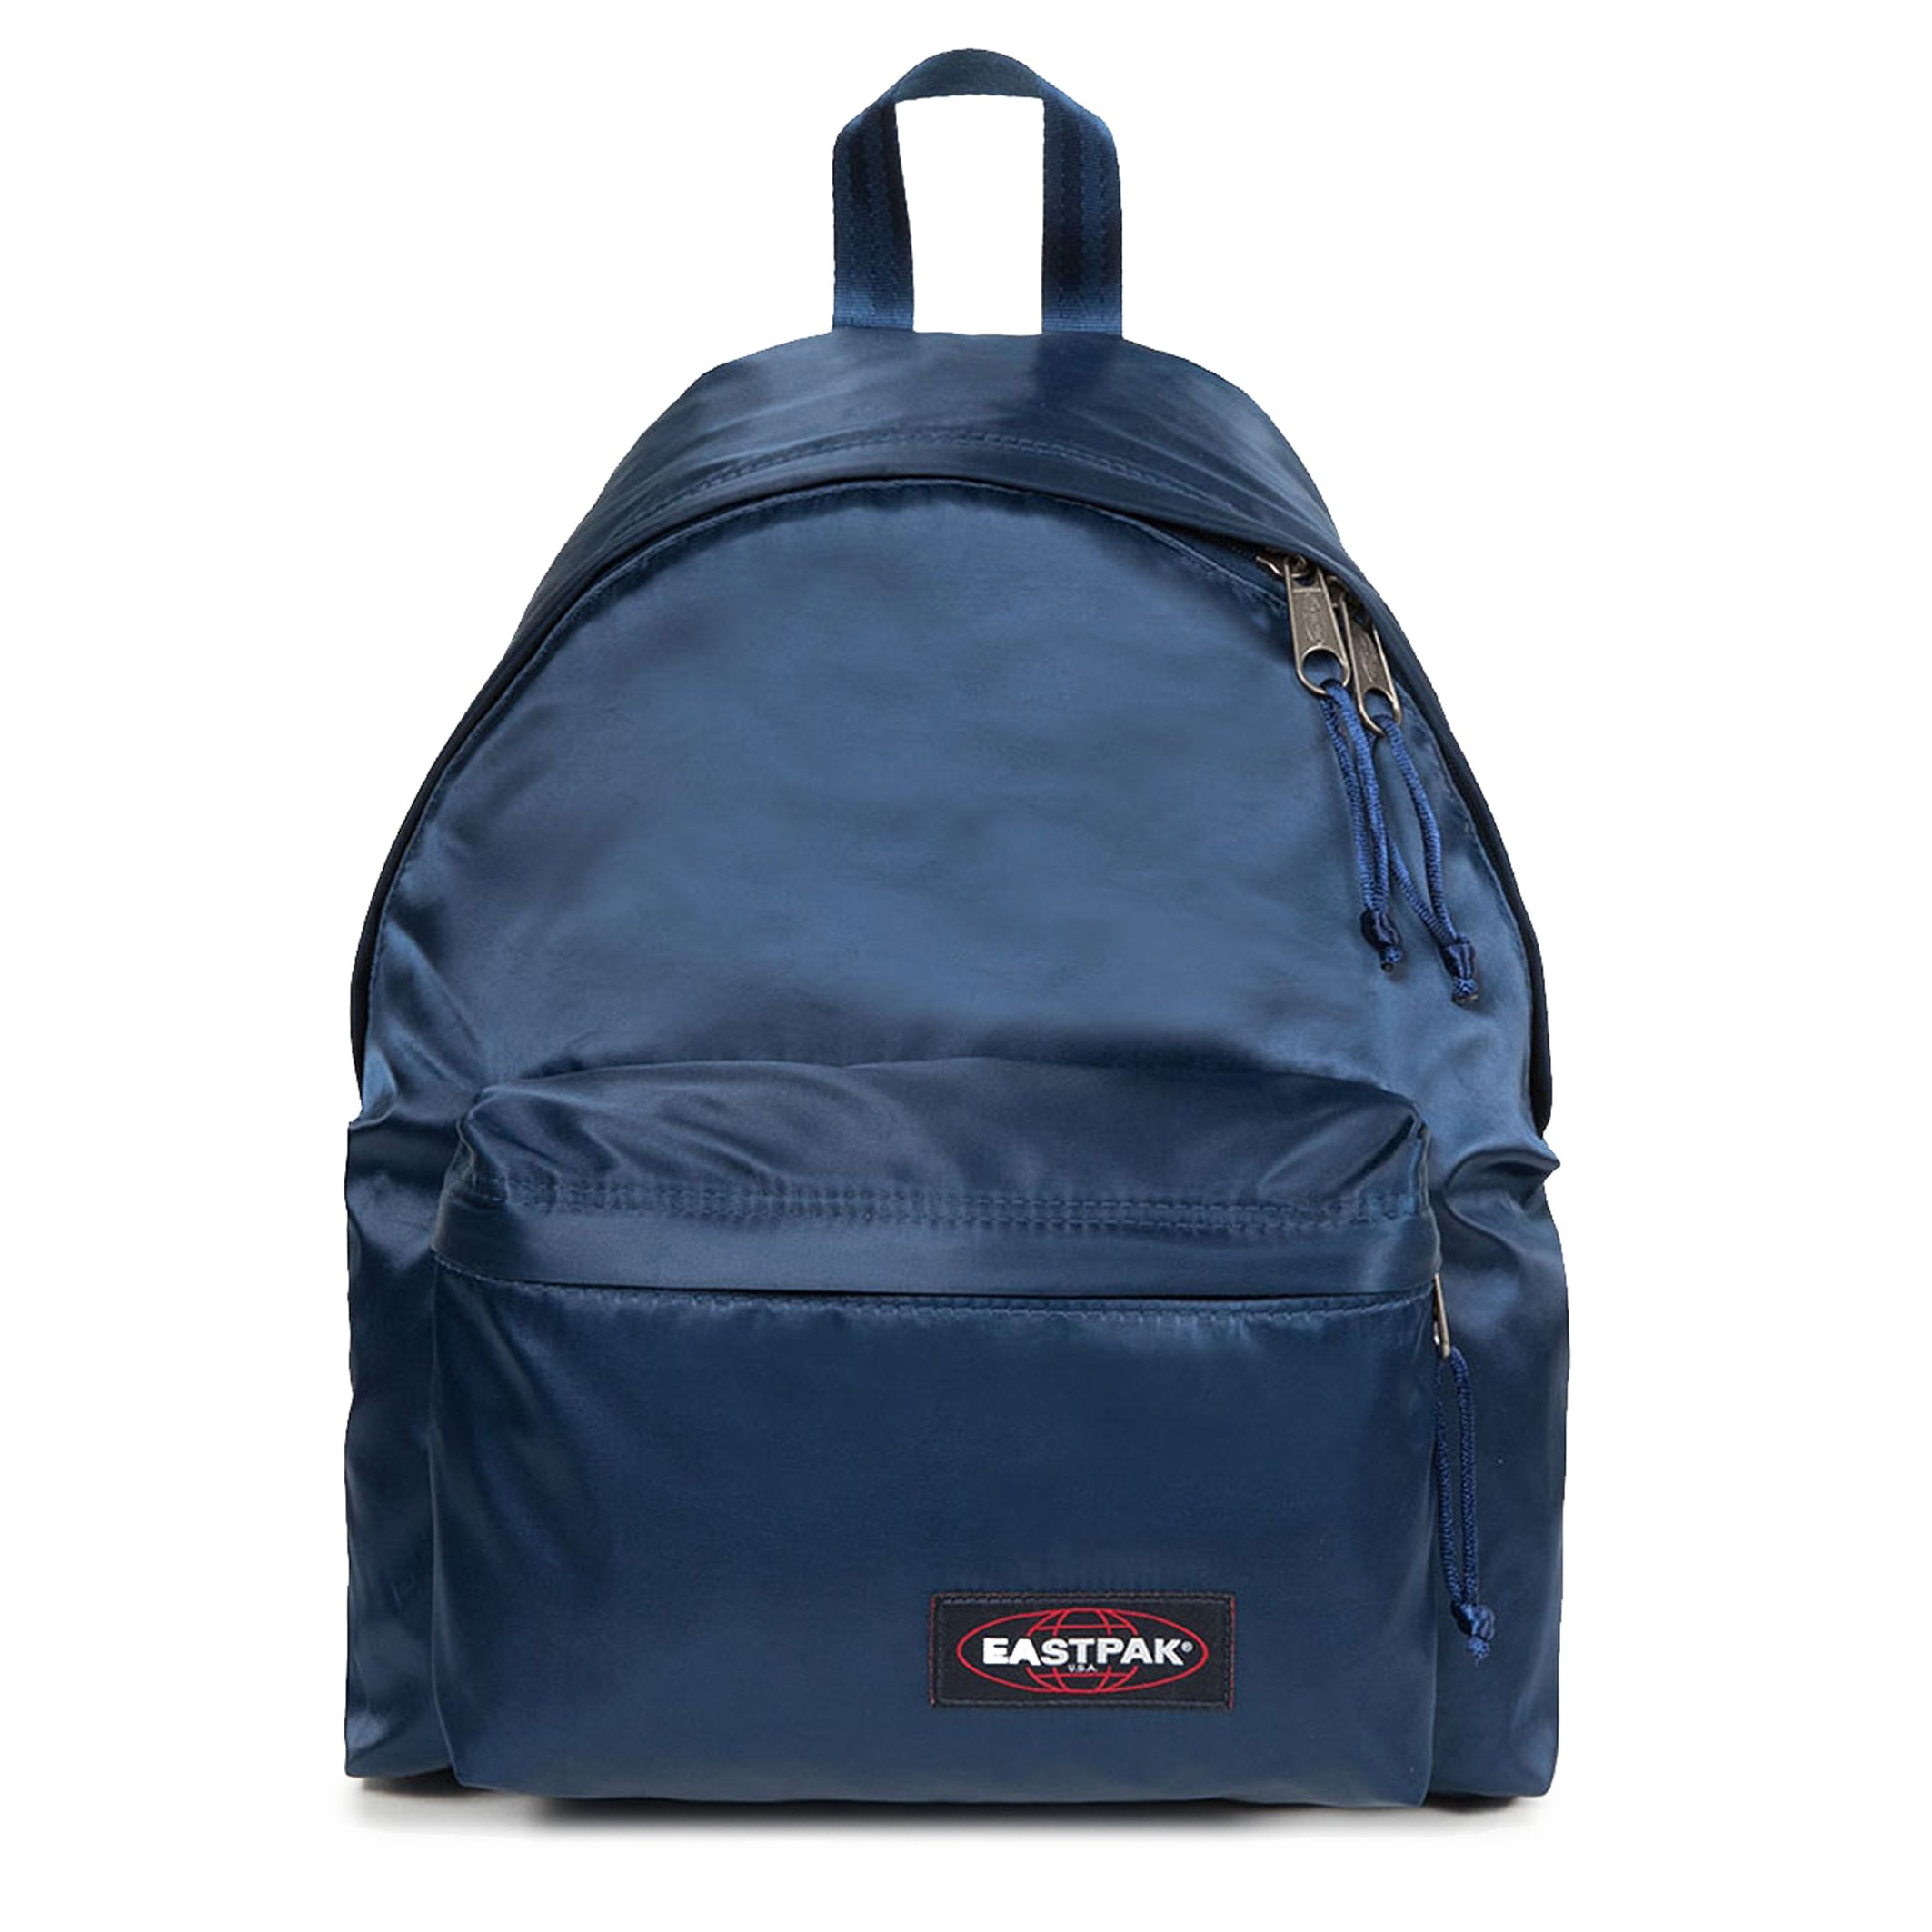 Eastpak Unsiex PADDED-PAKR Backpack Various Colours EK620_C39 - blue NOSIZE